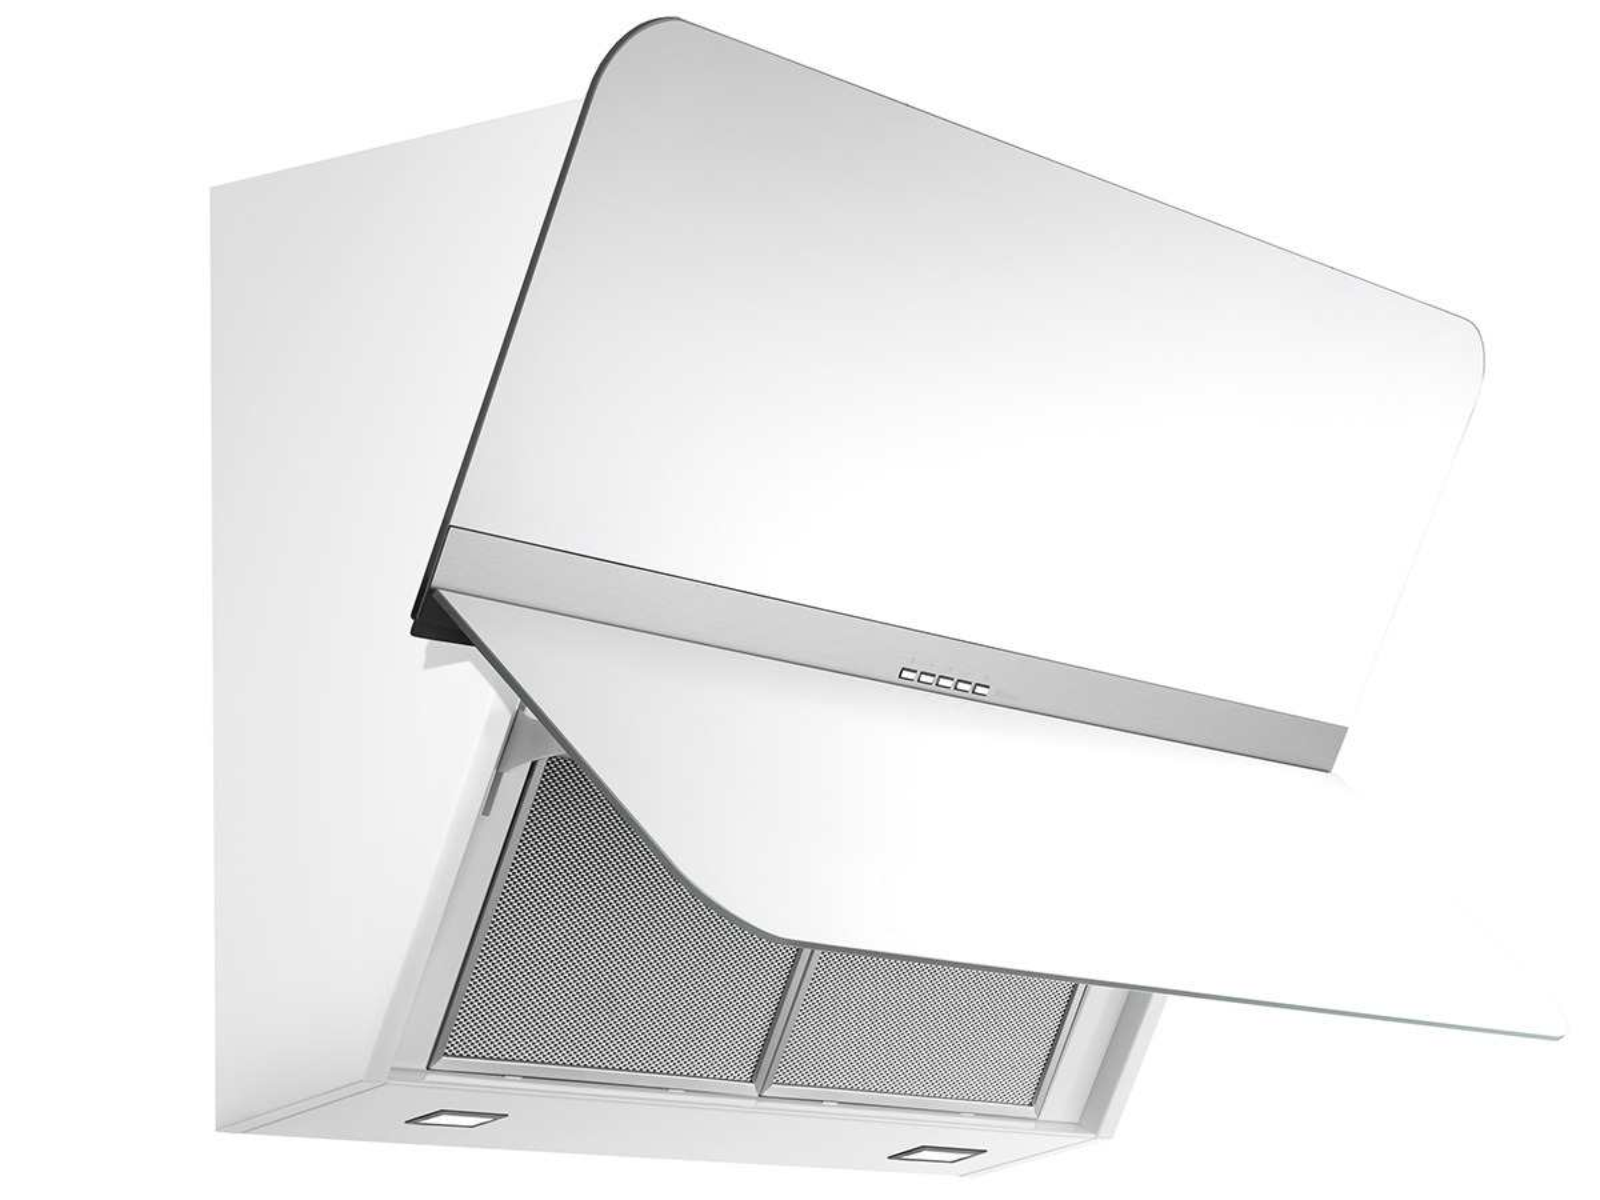 falmec flipper kopffrei wand dunstabzugshaube wei f r 1079 10 eur. Black Bedroom Furniture Sets. Home Design Ideas